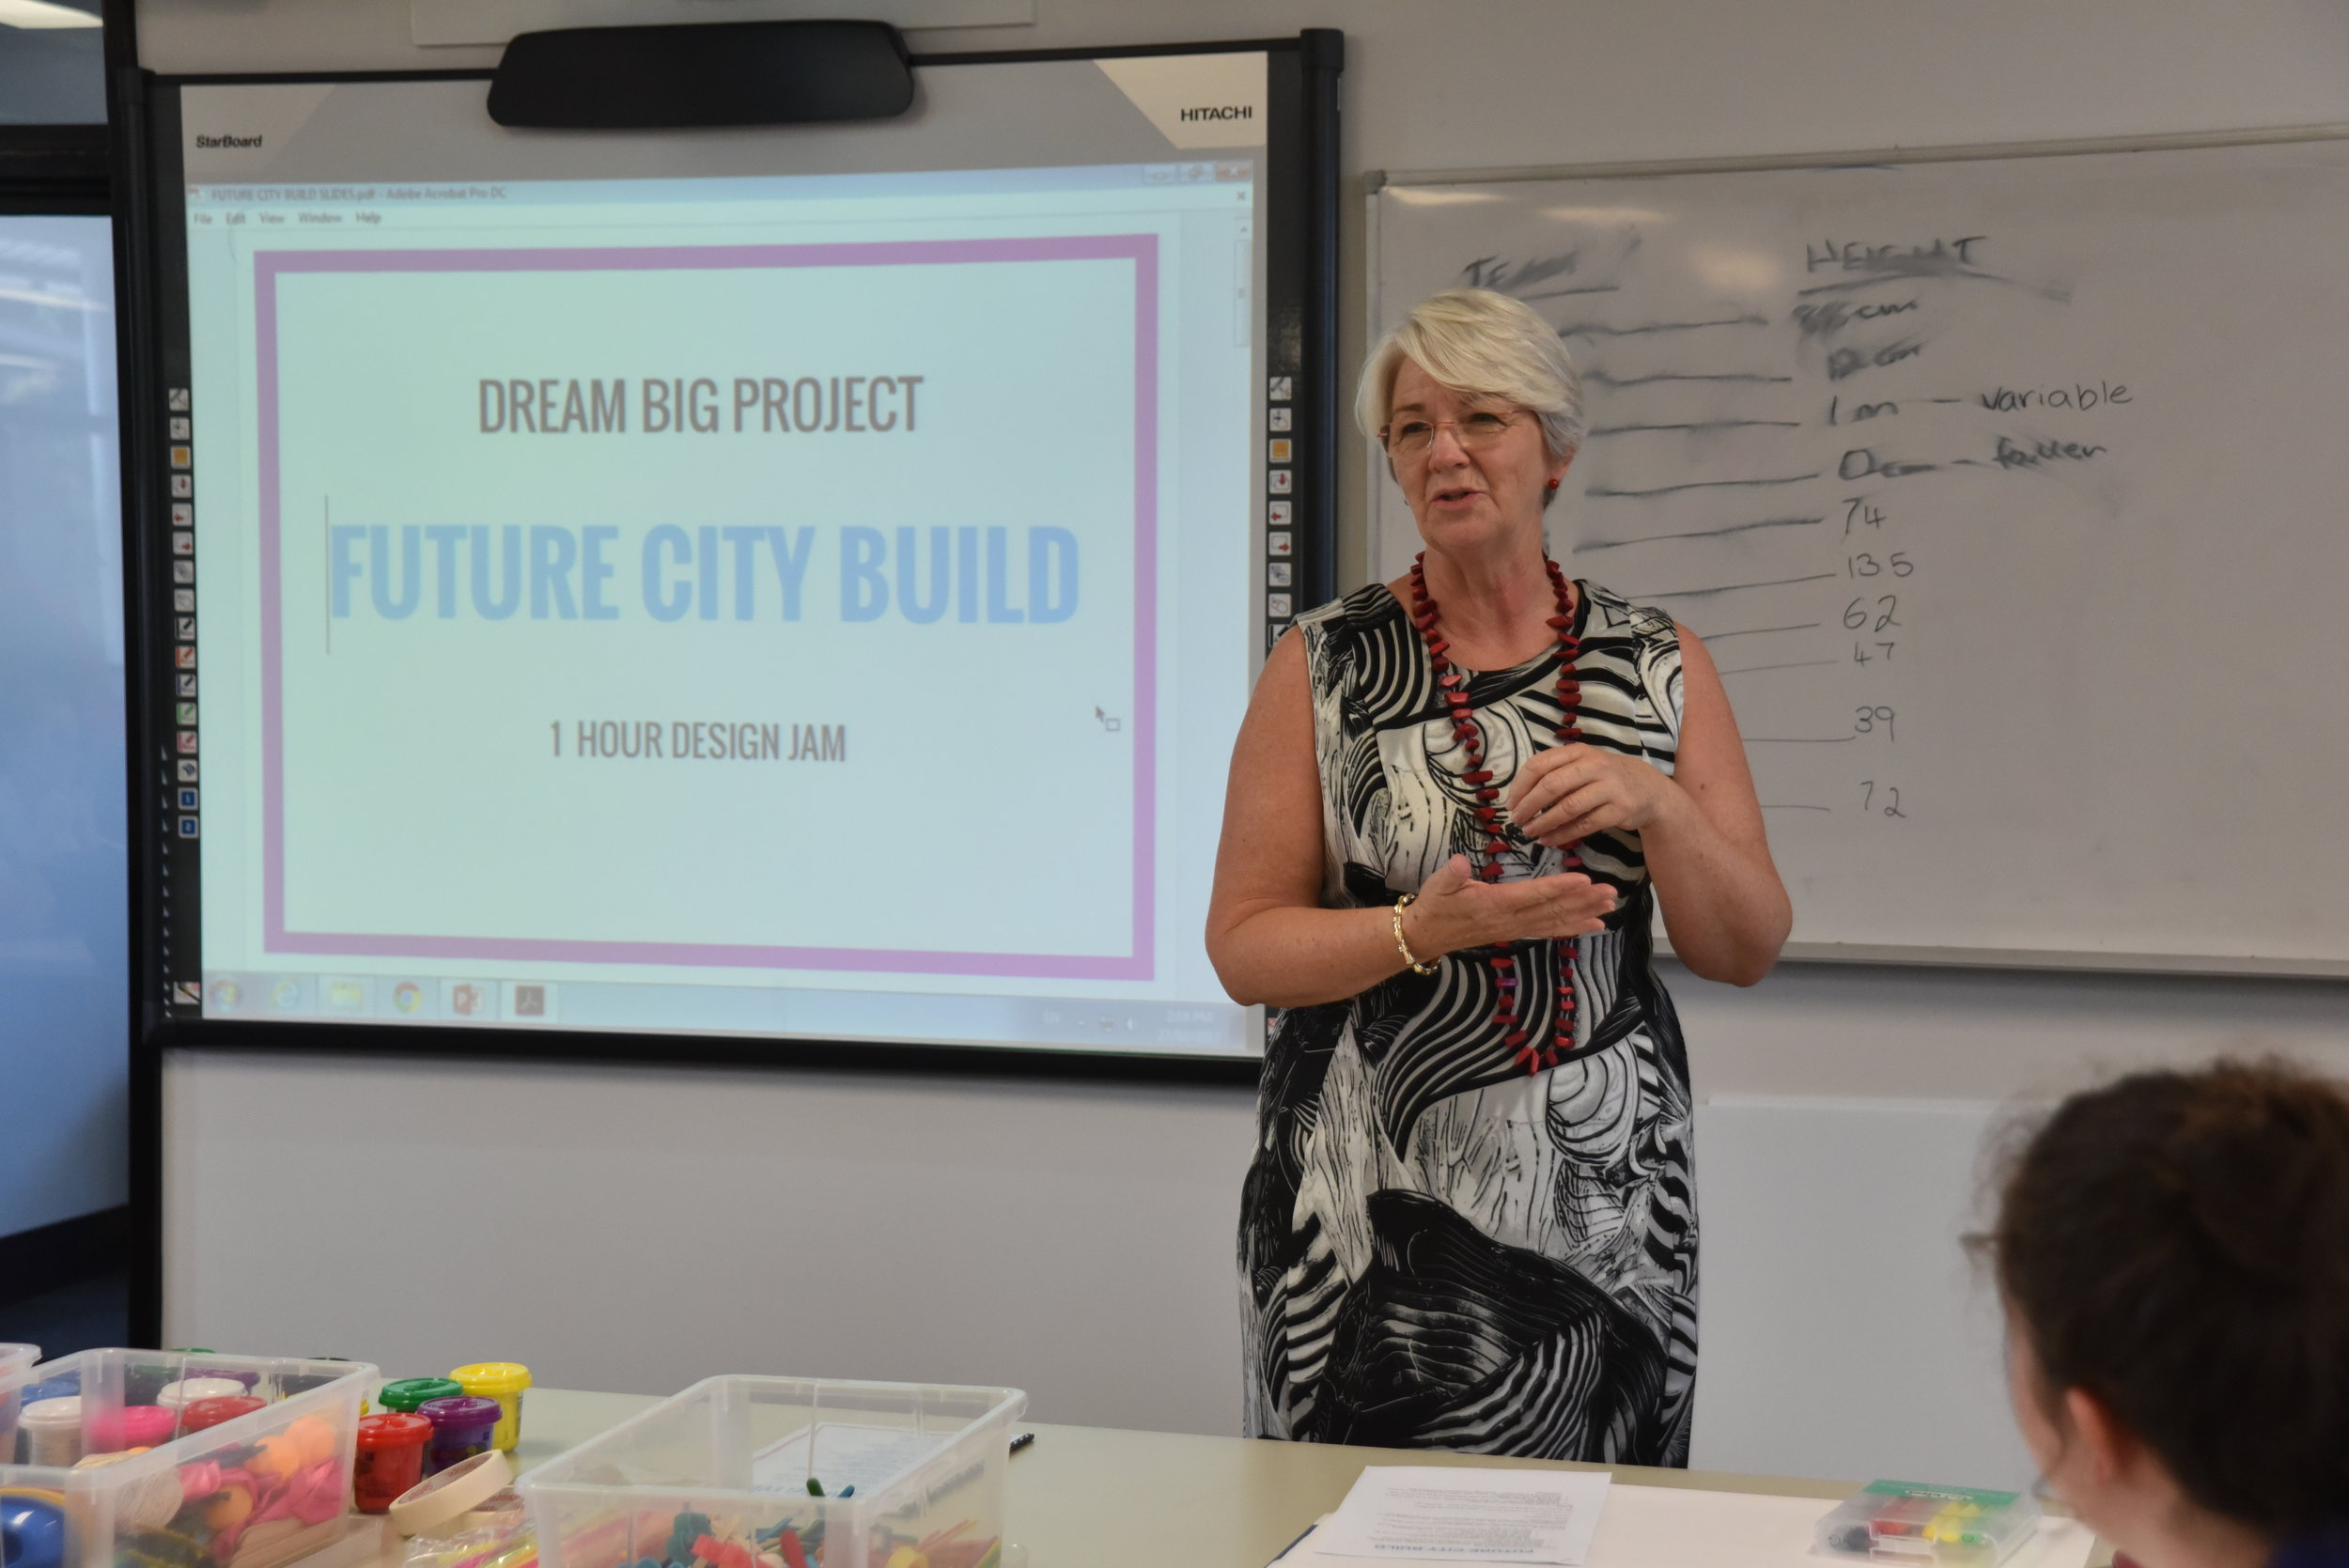 2017 Dream Big Event:  Future City Build with Rockhampton Mayor, Margaret Strelow